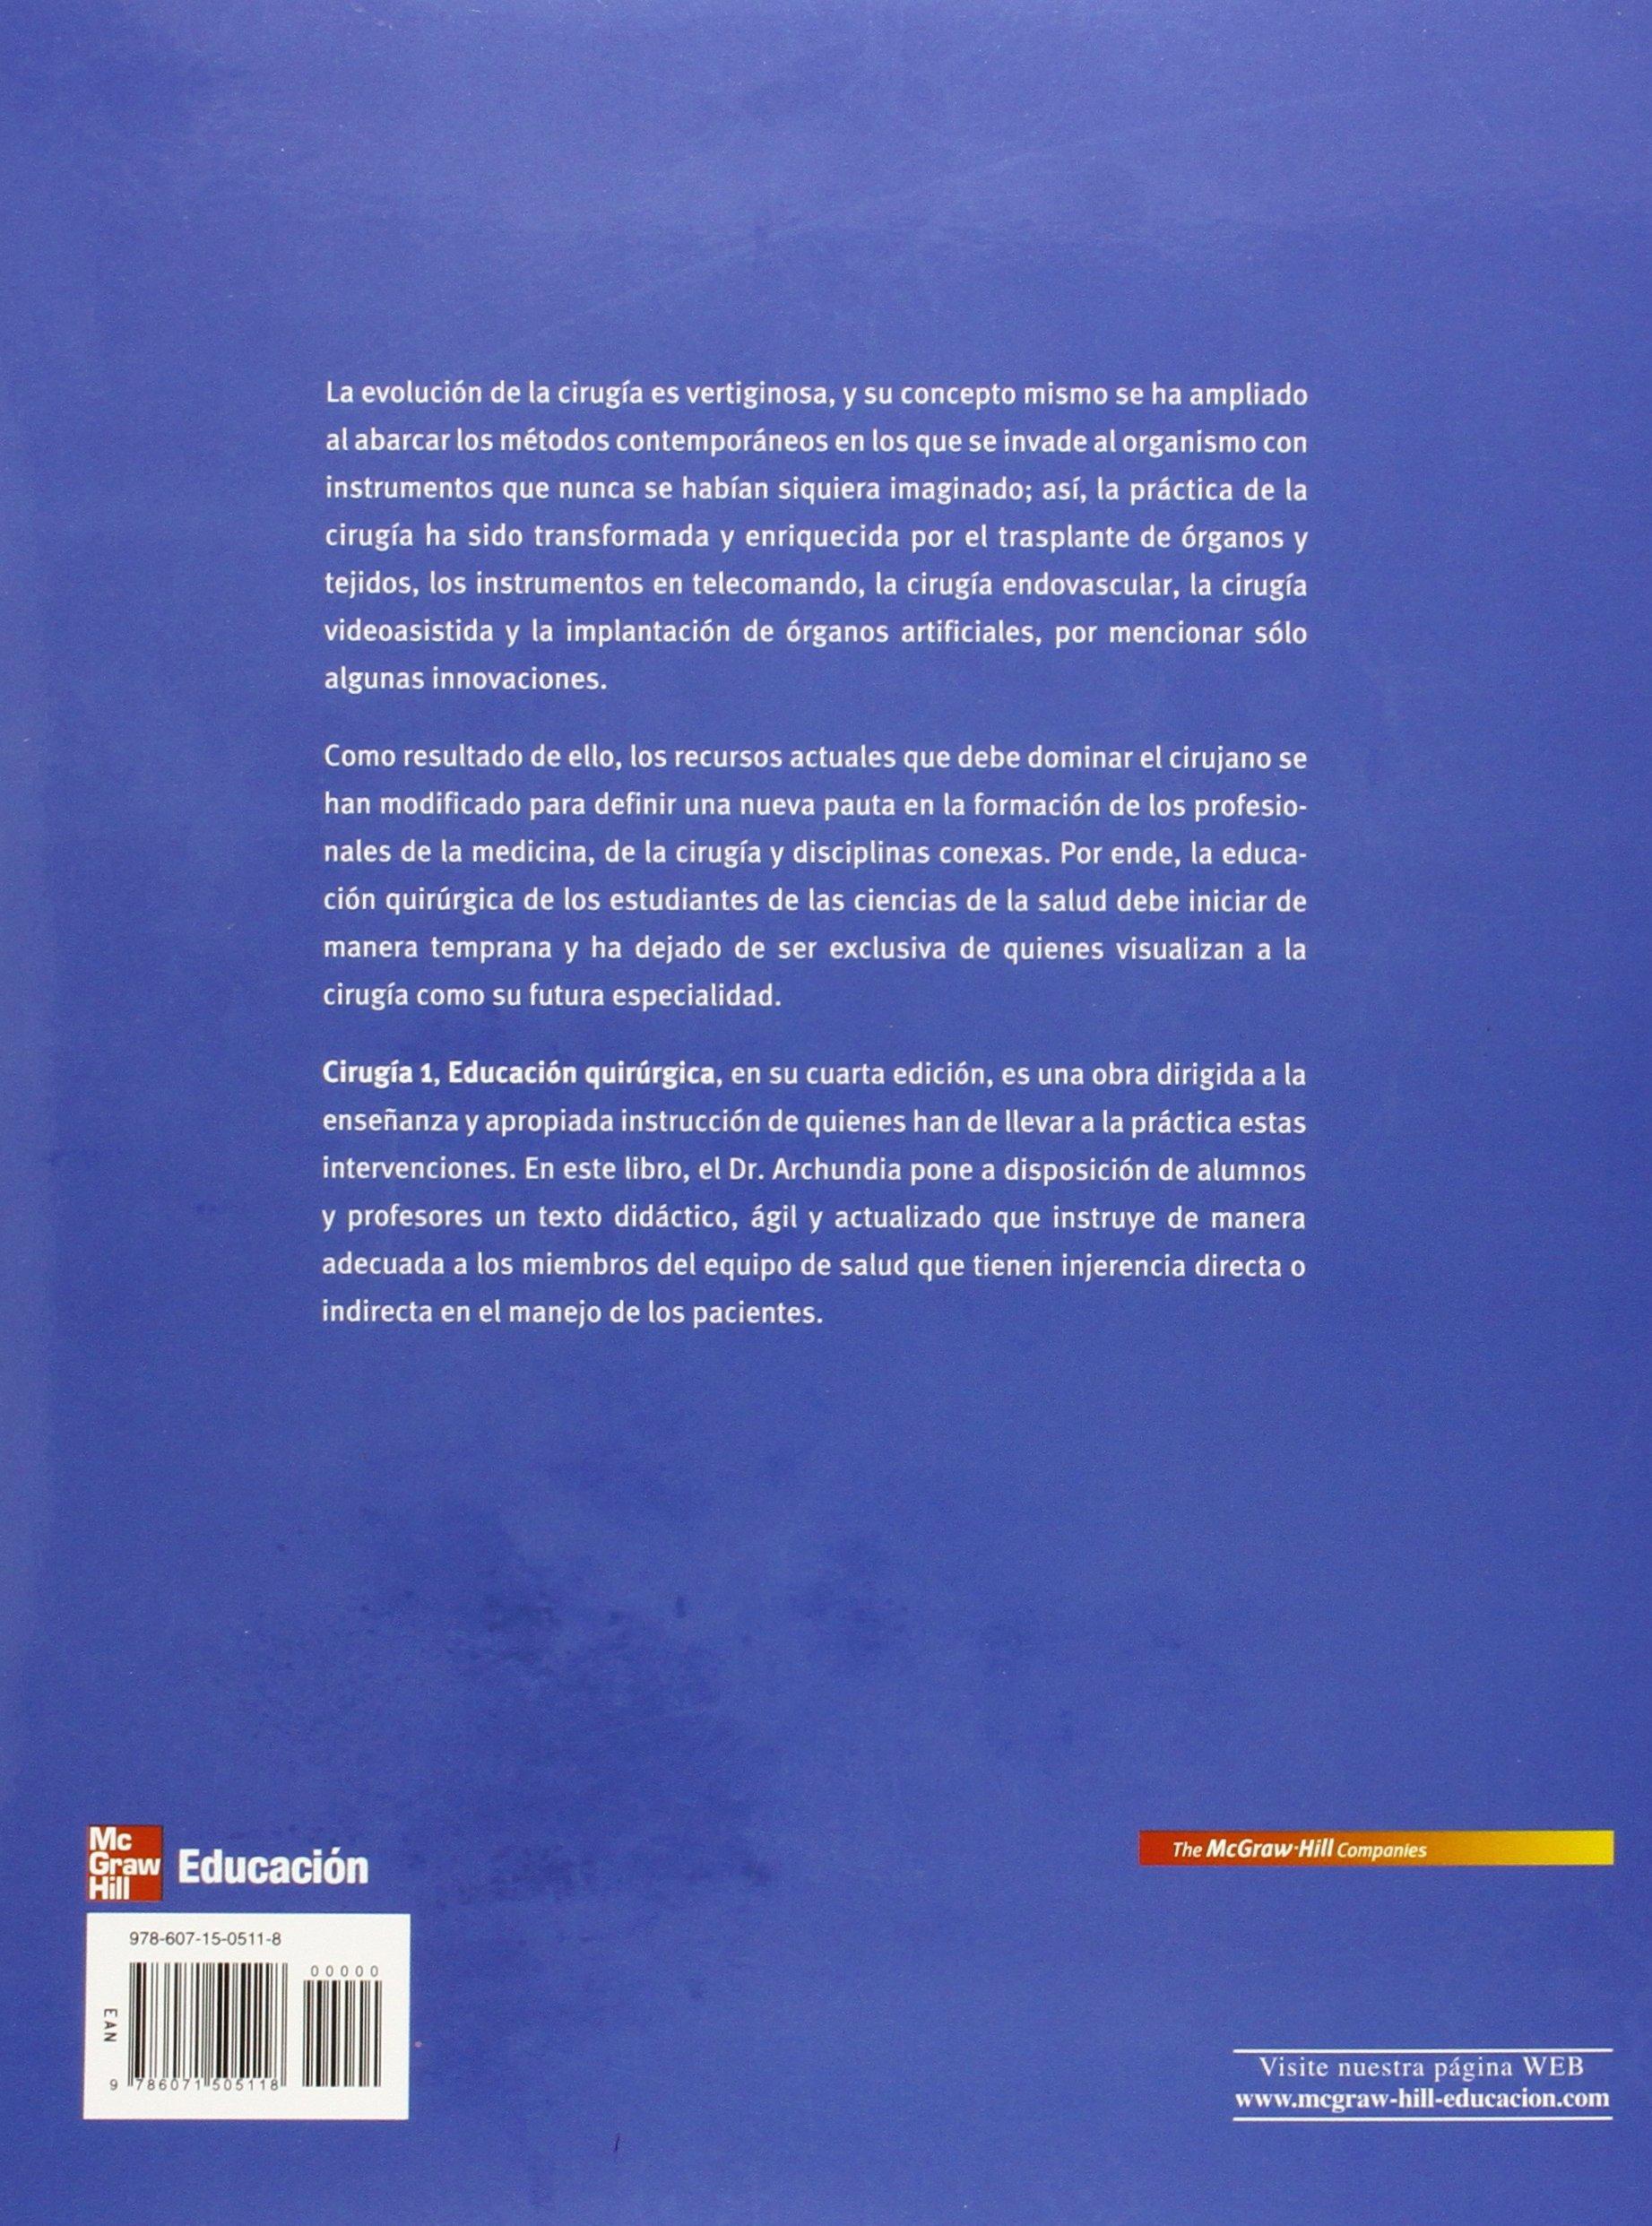 Cirugia 1 educacion quirurgica 4ed abel archundia garc a 9786071505118 amazon com books